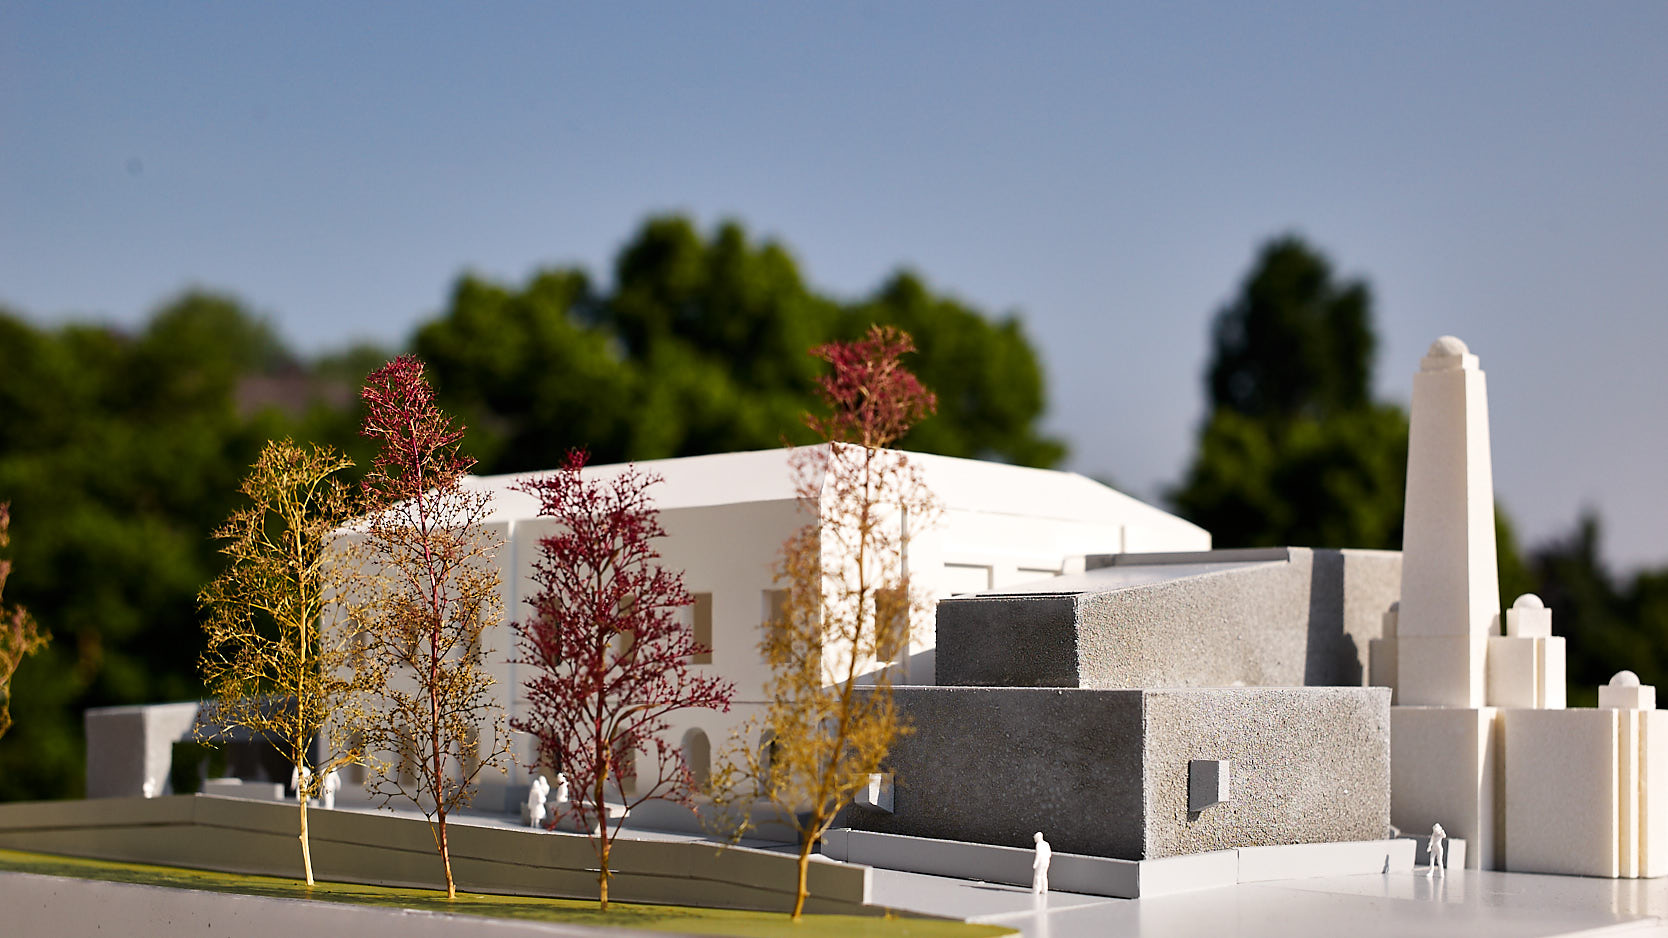 Zentralfriedhof: South